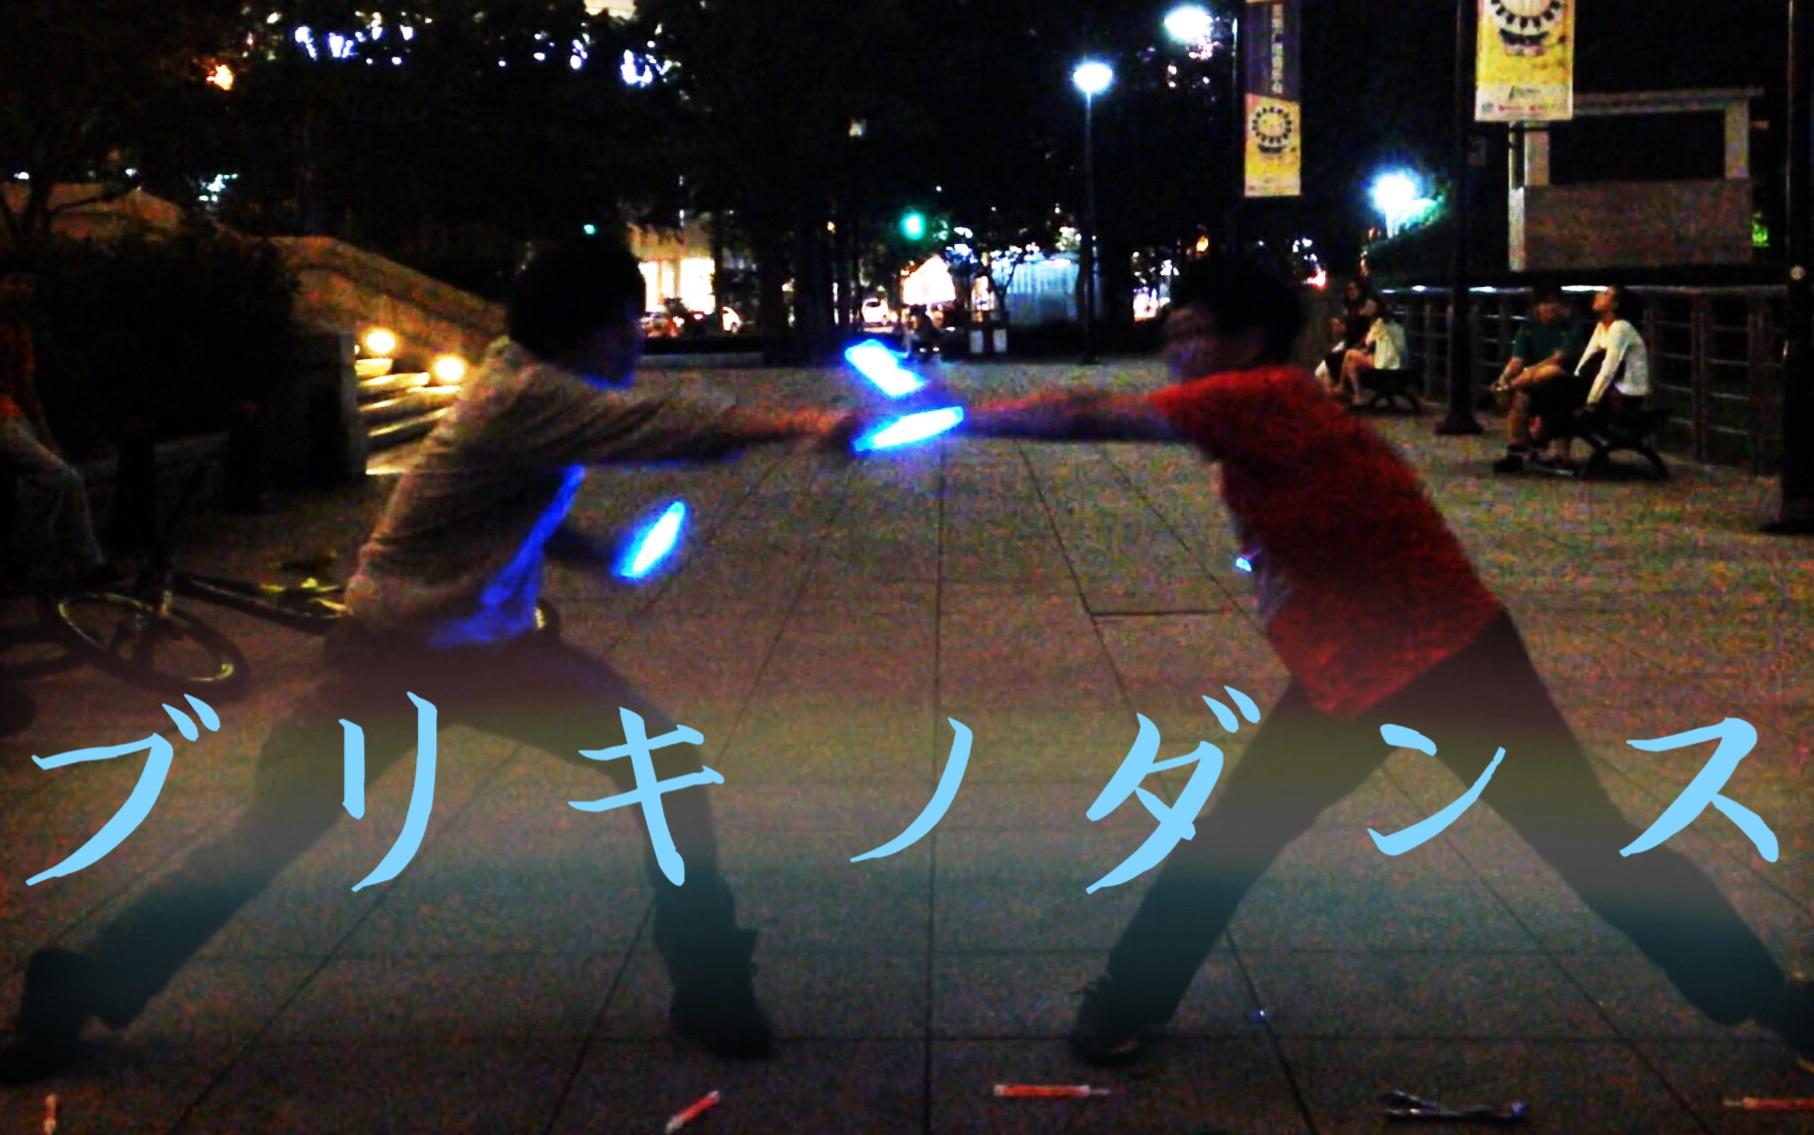 马口铁之舞_【wota艺】马口铁之舞【10月10日新作公开!】_哔哩哔哩 (゜-゜)つ ...